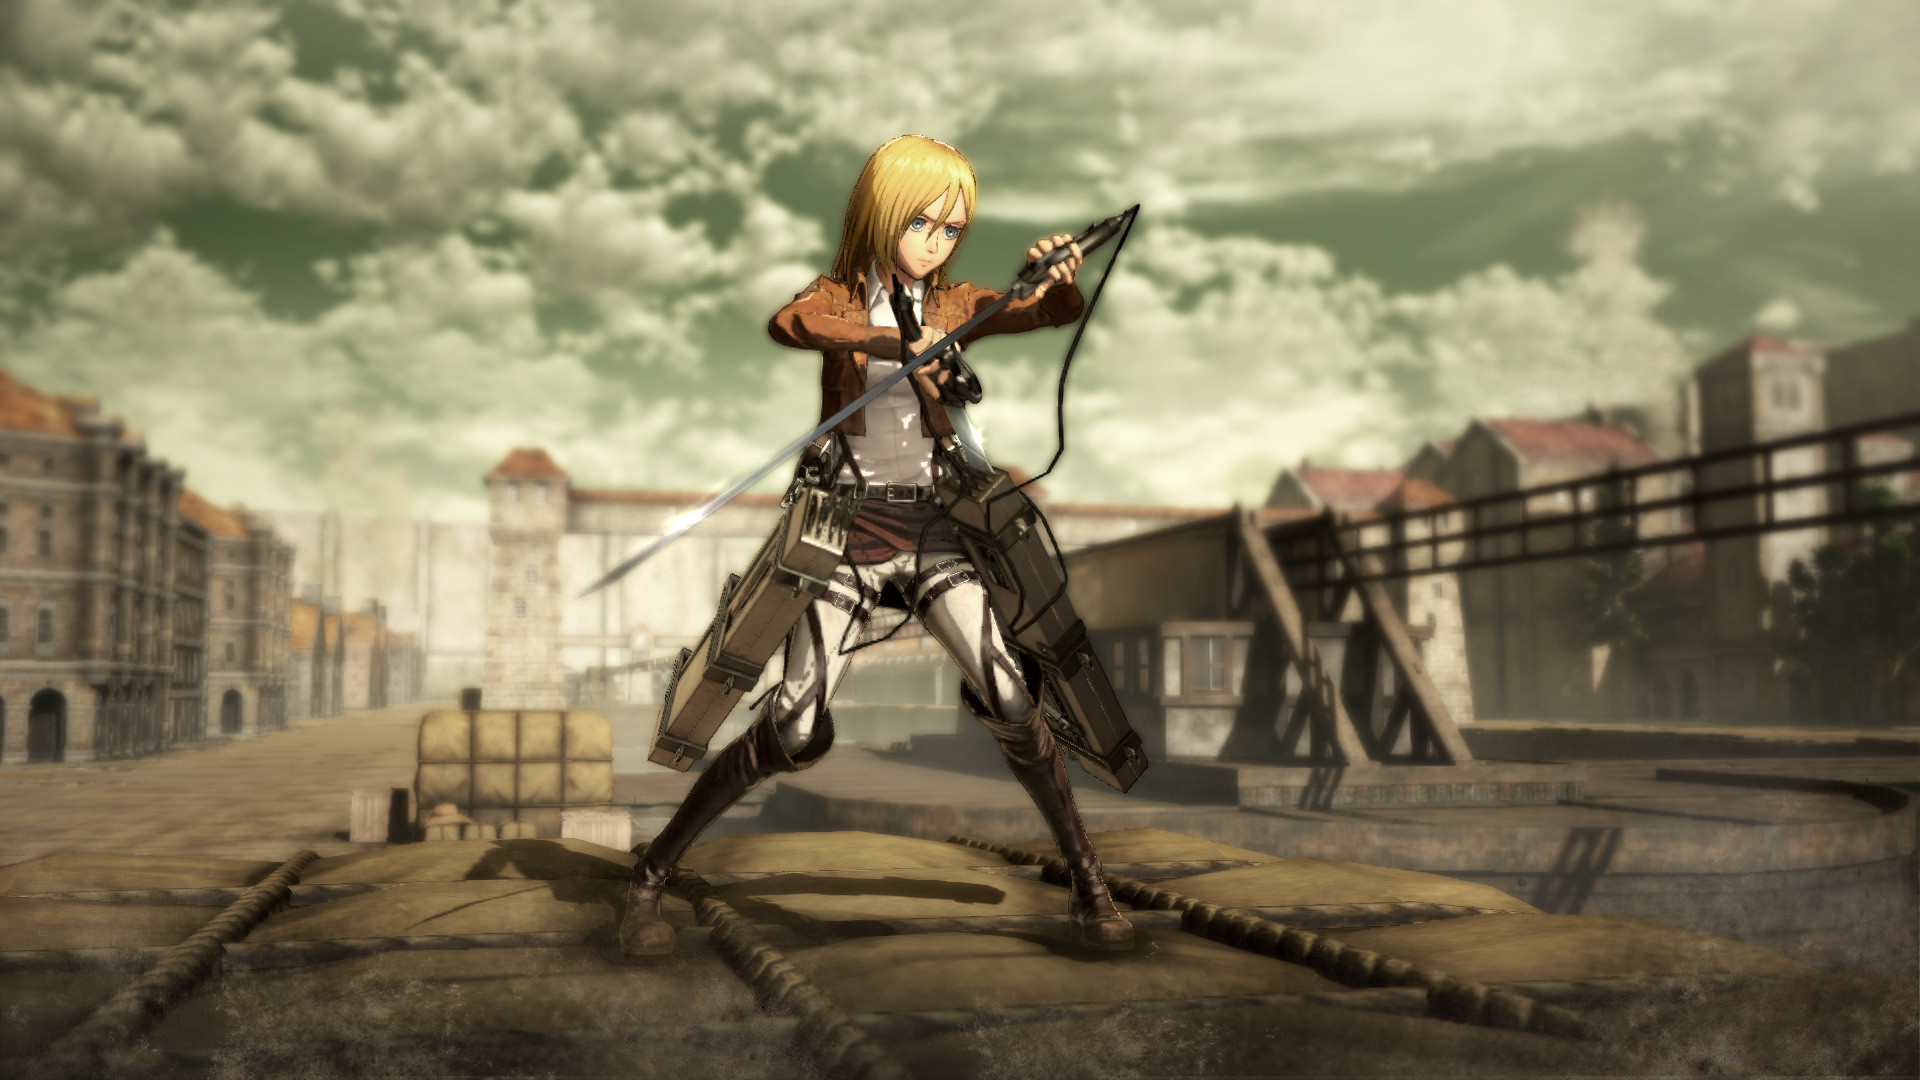 Action_Armin Action_Armin2 Action_Christa Action_Christa1 Action_Christa2  …